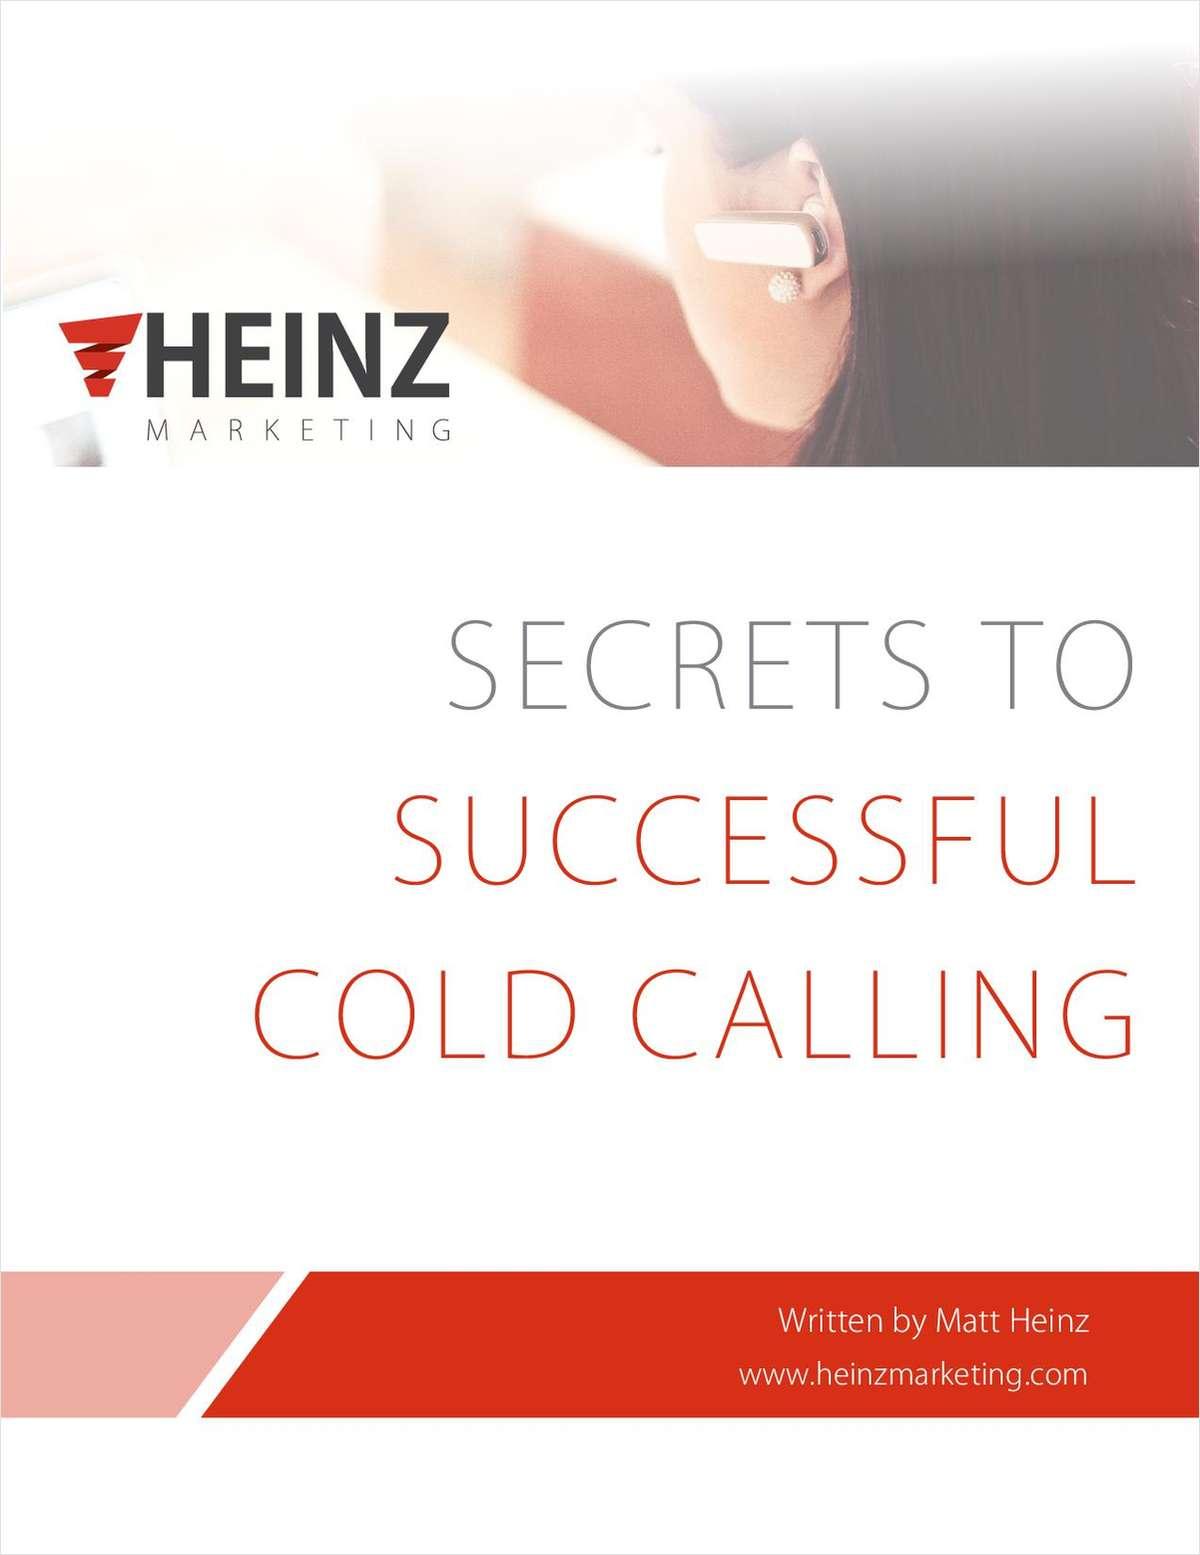 Secrets to Successful Cold Calling